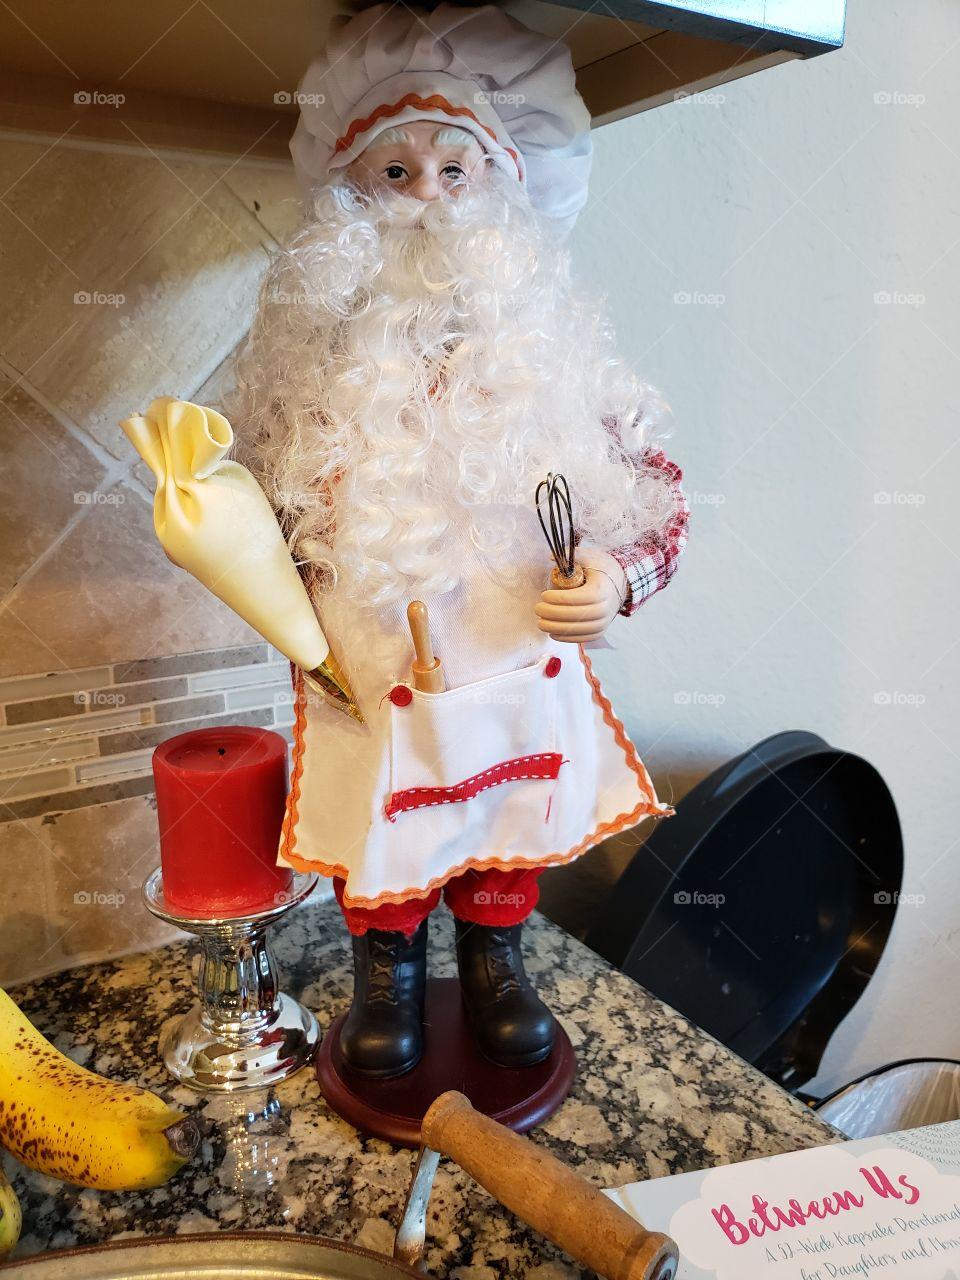 Baker Santa Claus